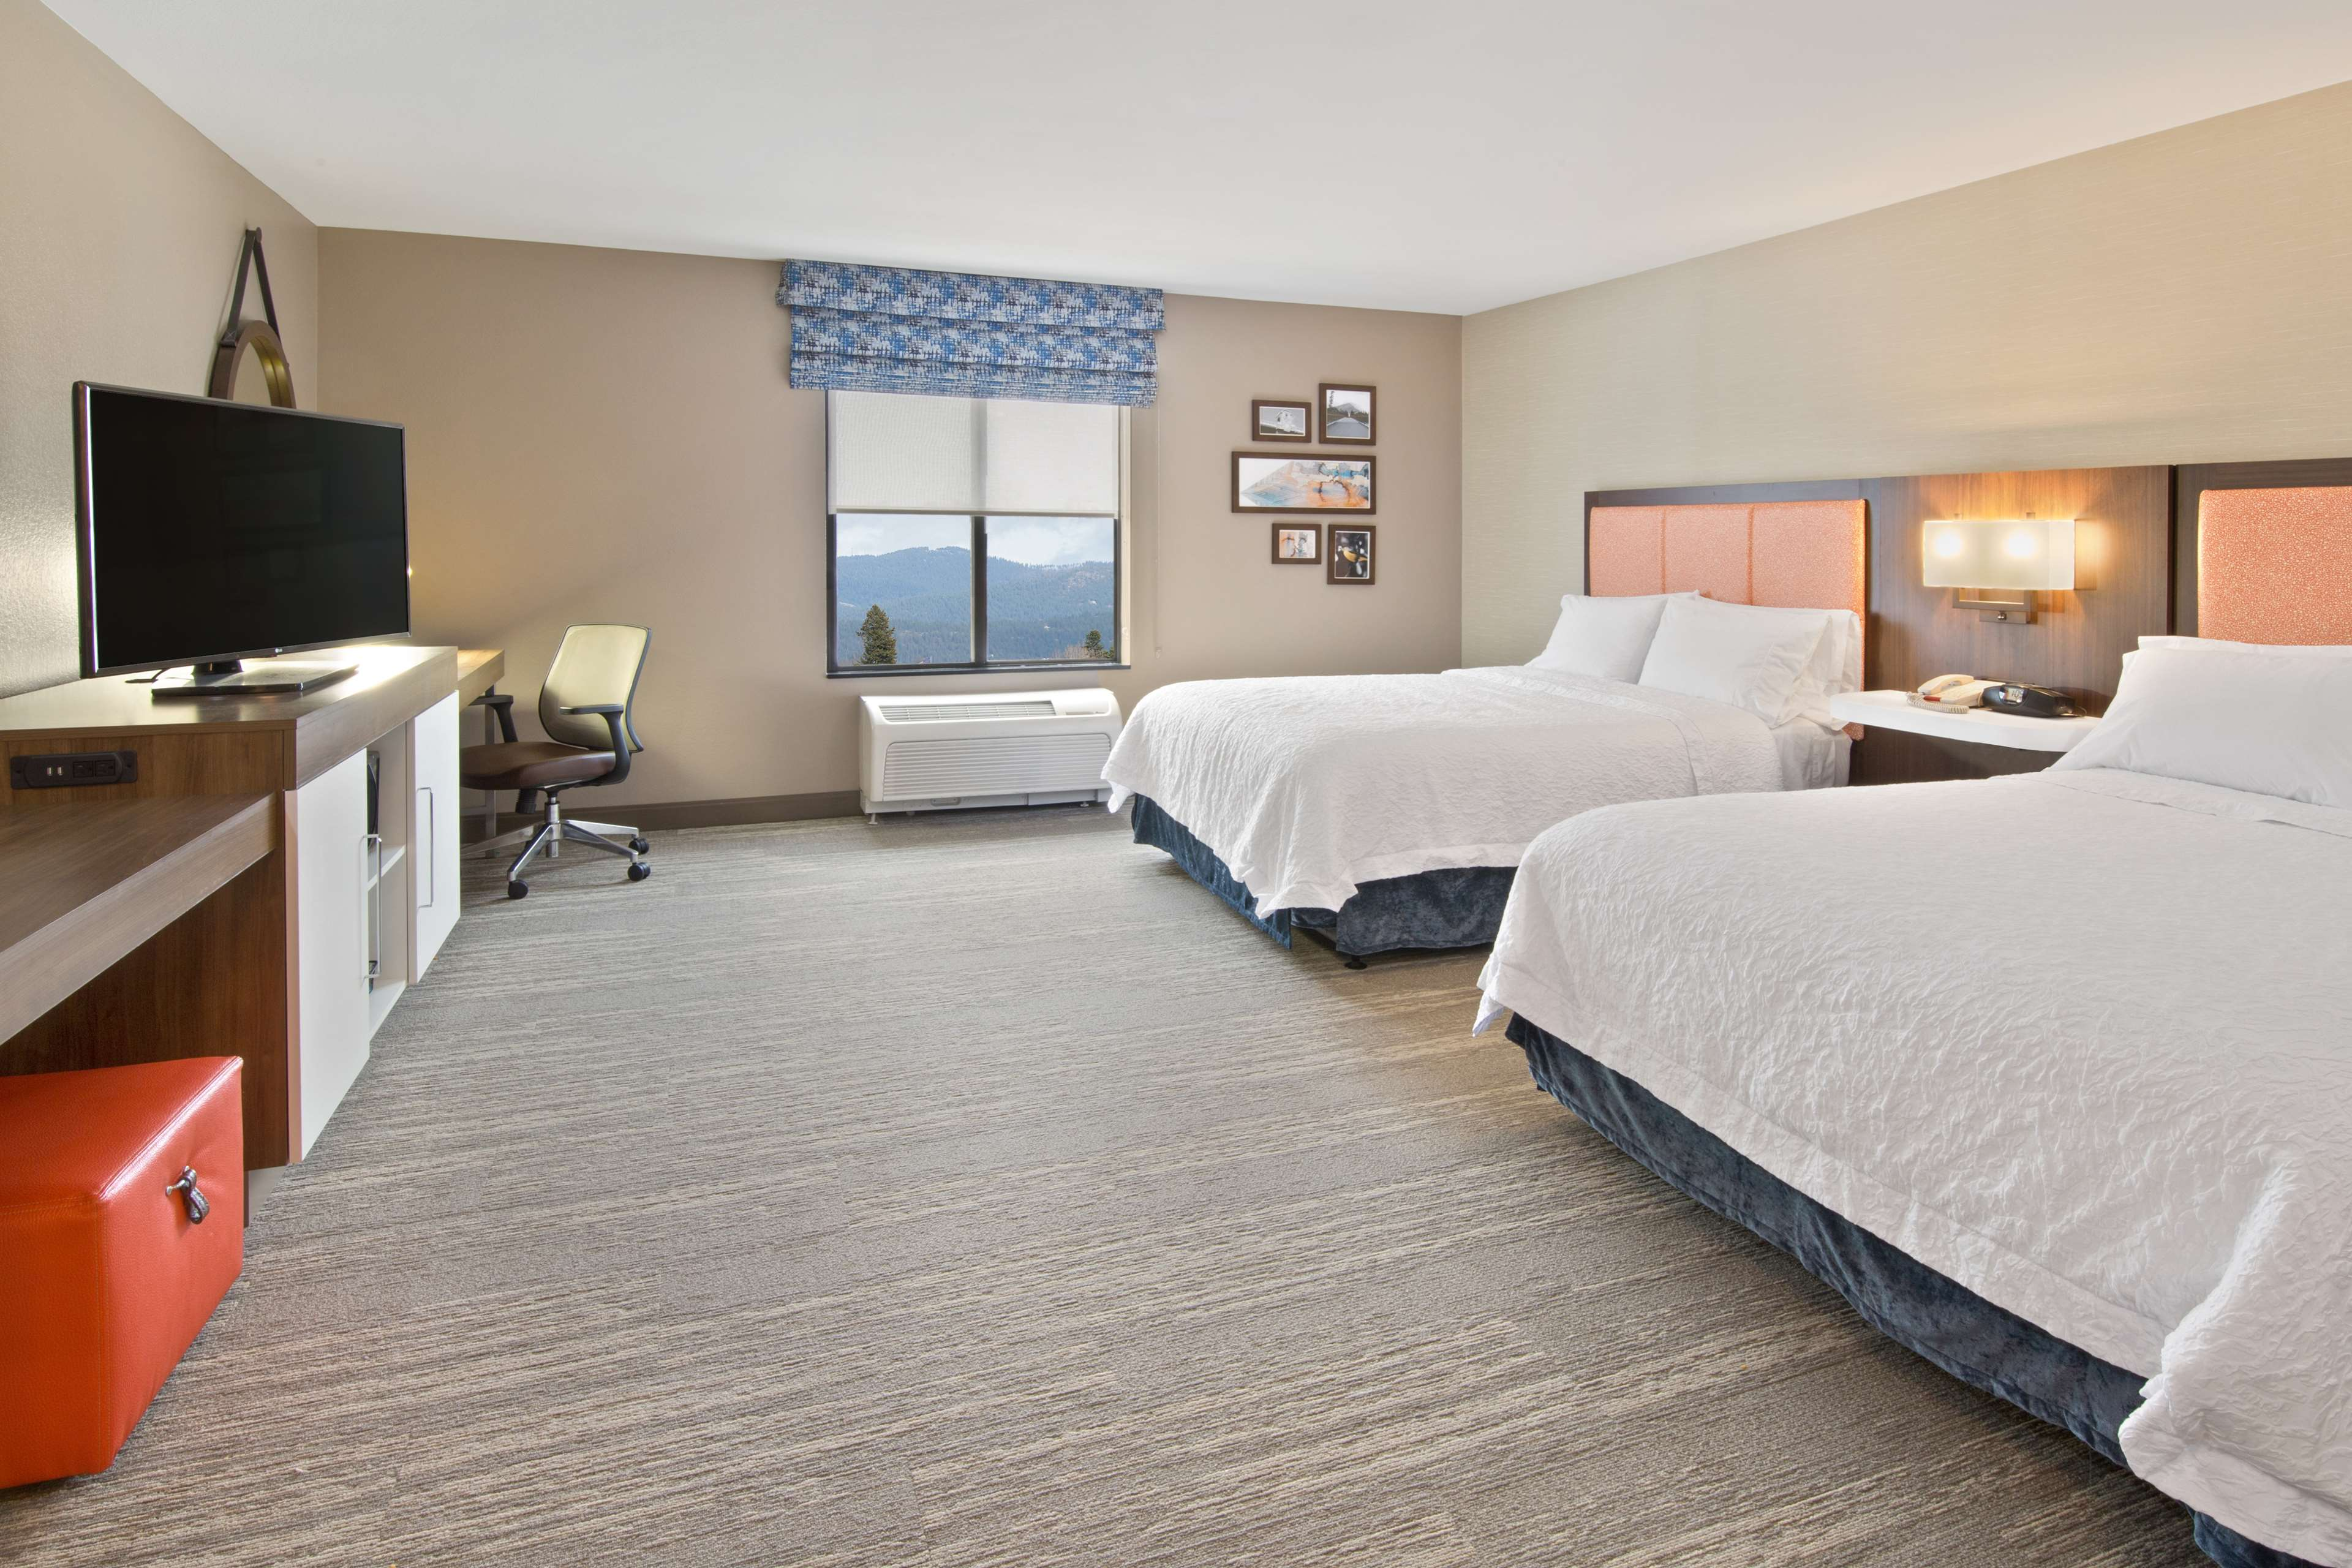 Hampton Inn & Suites Spokane Valley image 23